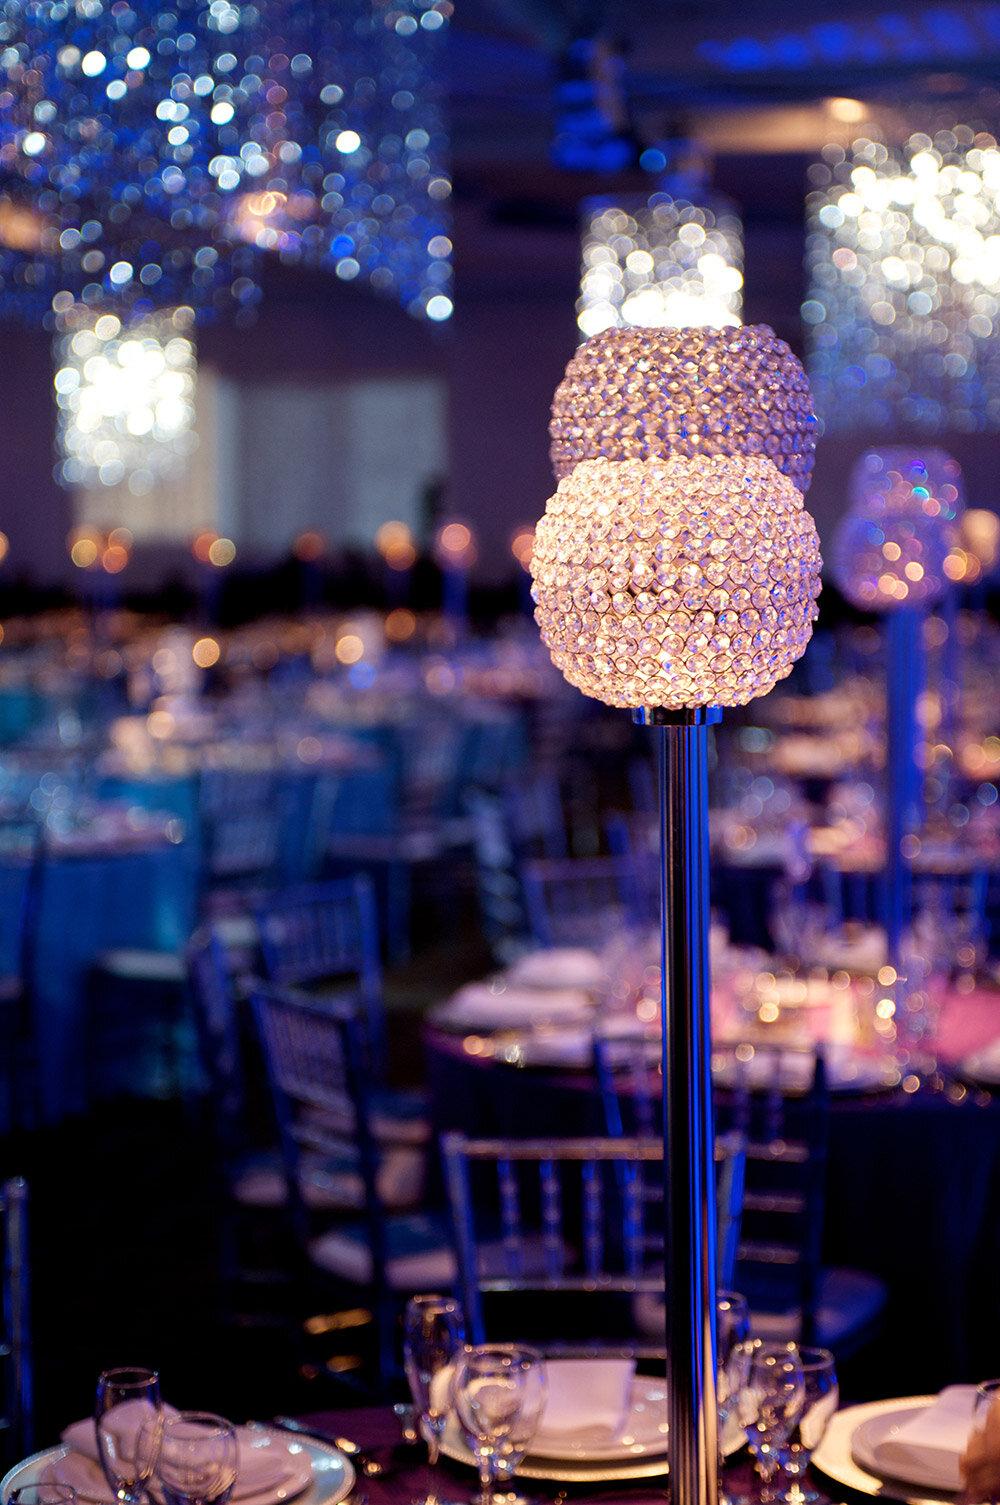 Paras-Events-Gala-Design-Ice-Winter-Wonderland-Party-Trillium-Health-Partners-Foundation-3.jpg